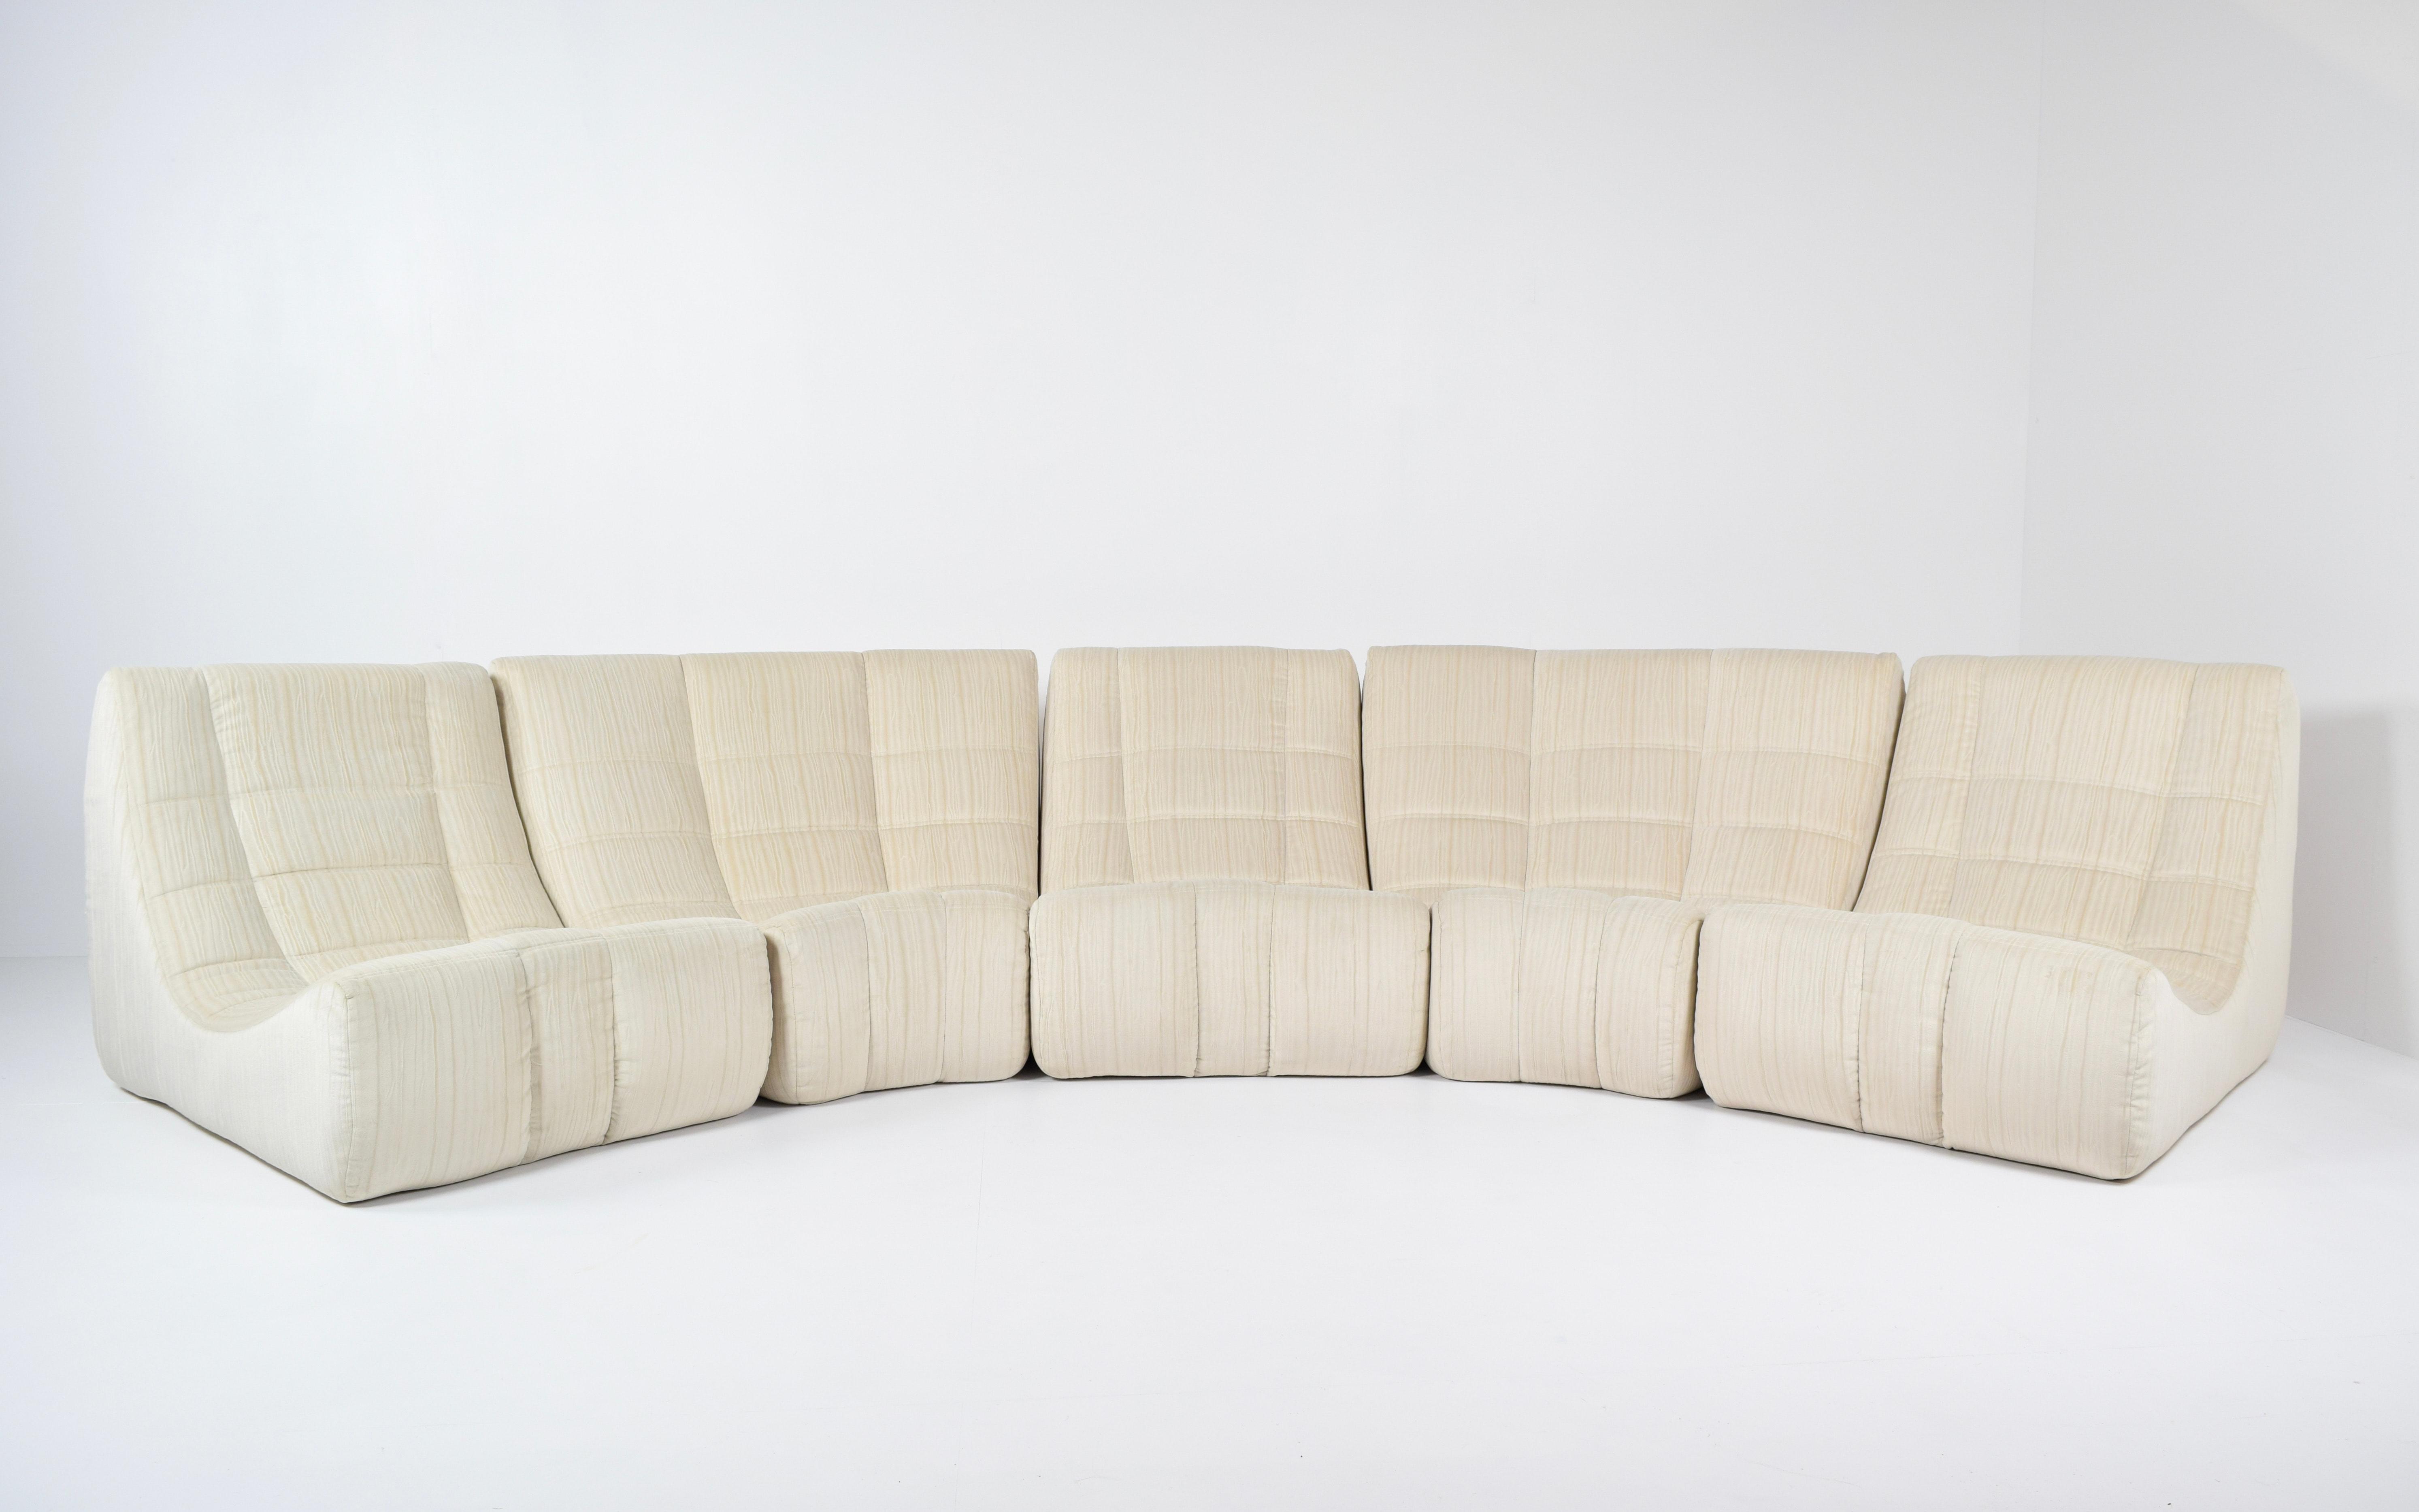 Modular Sofa 'Gilda' by Michel Ducaroy for Ligne Roset, France 1972